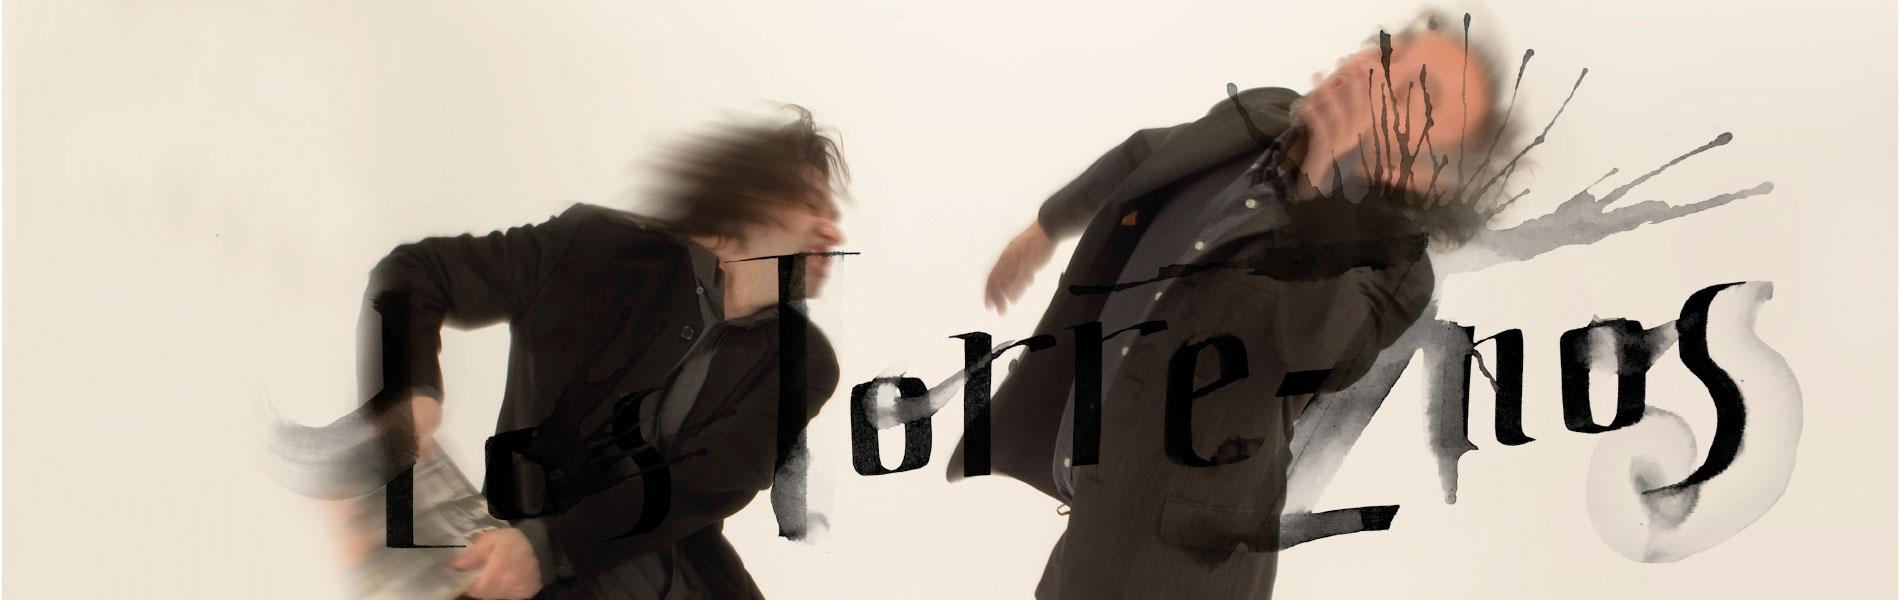 VOCIFERIO-2017-poesia-valencia-slider-web-07